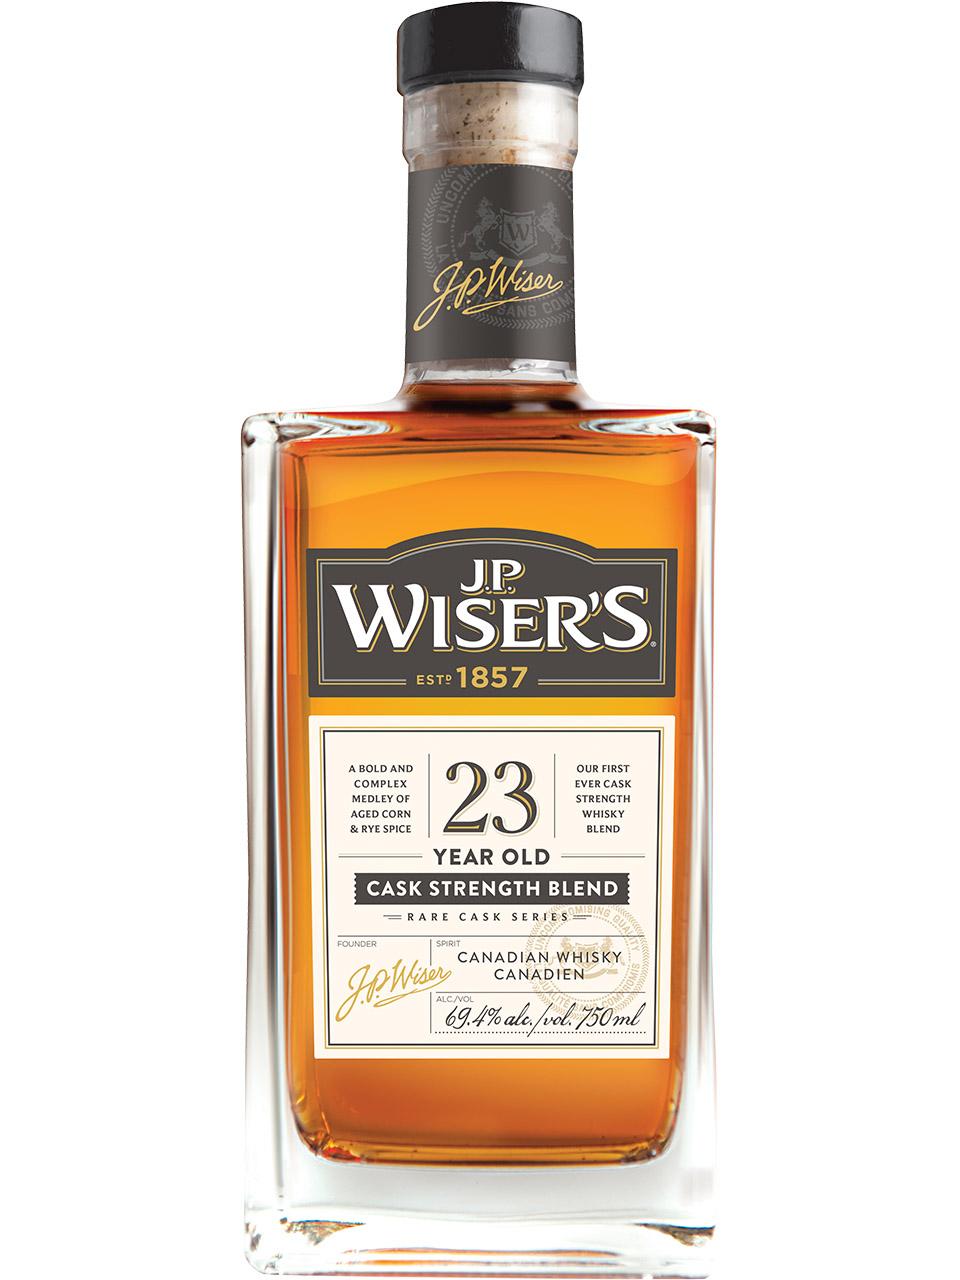 J.P. Wiser's 23 YO Canadian Whisky